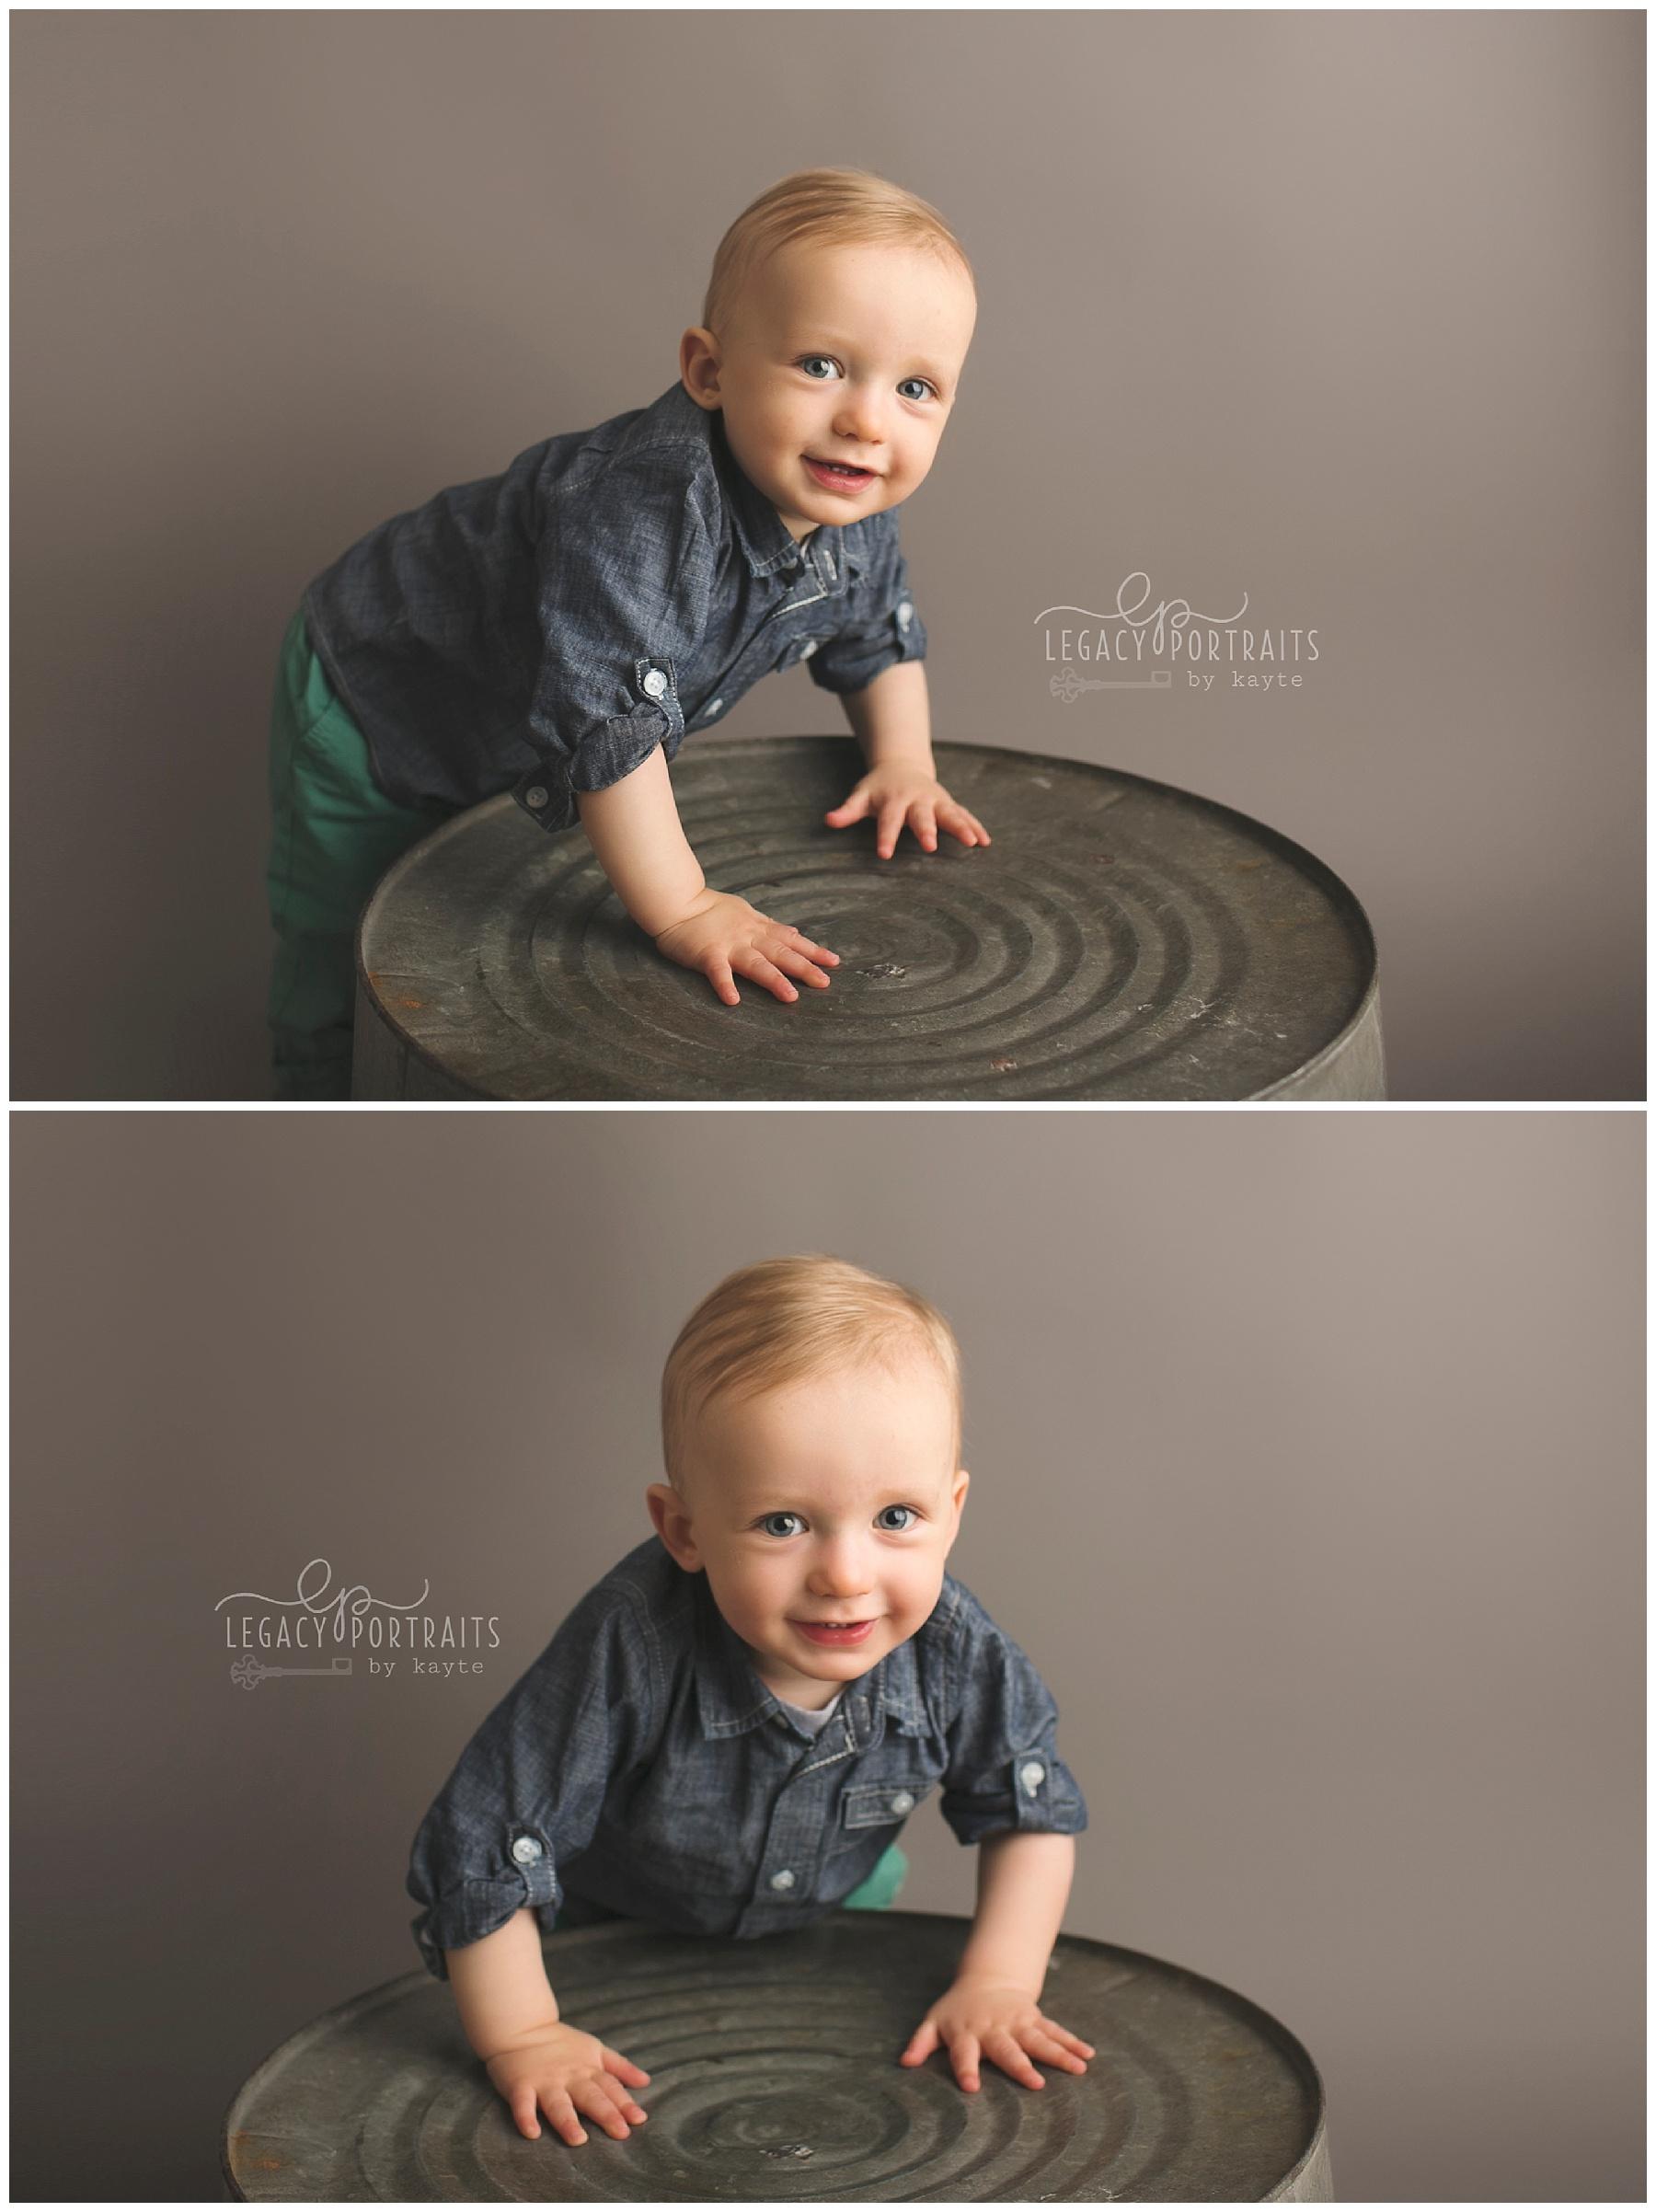 Fort Wayne Baby Photographer | Legacy Portraits by Kayte | www.legacyportraitsbykayte.com